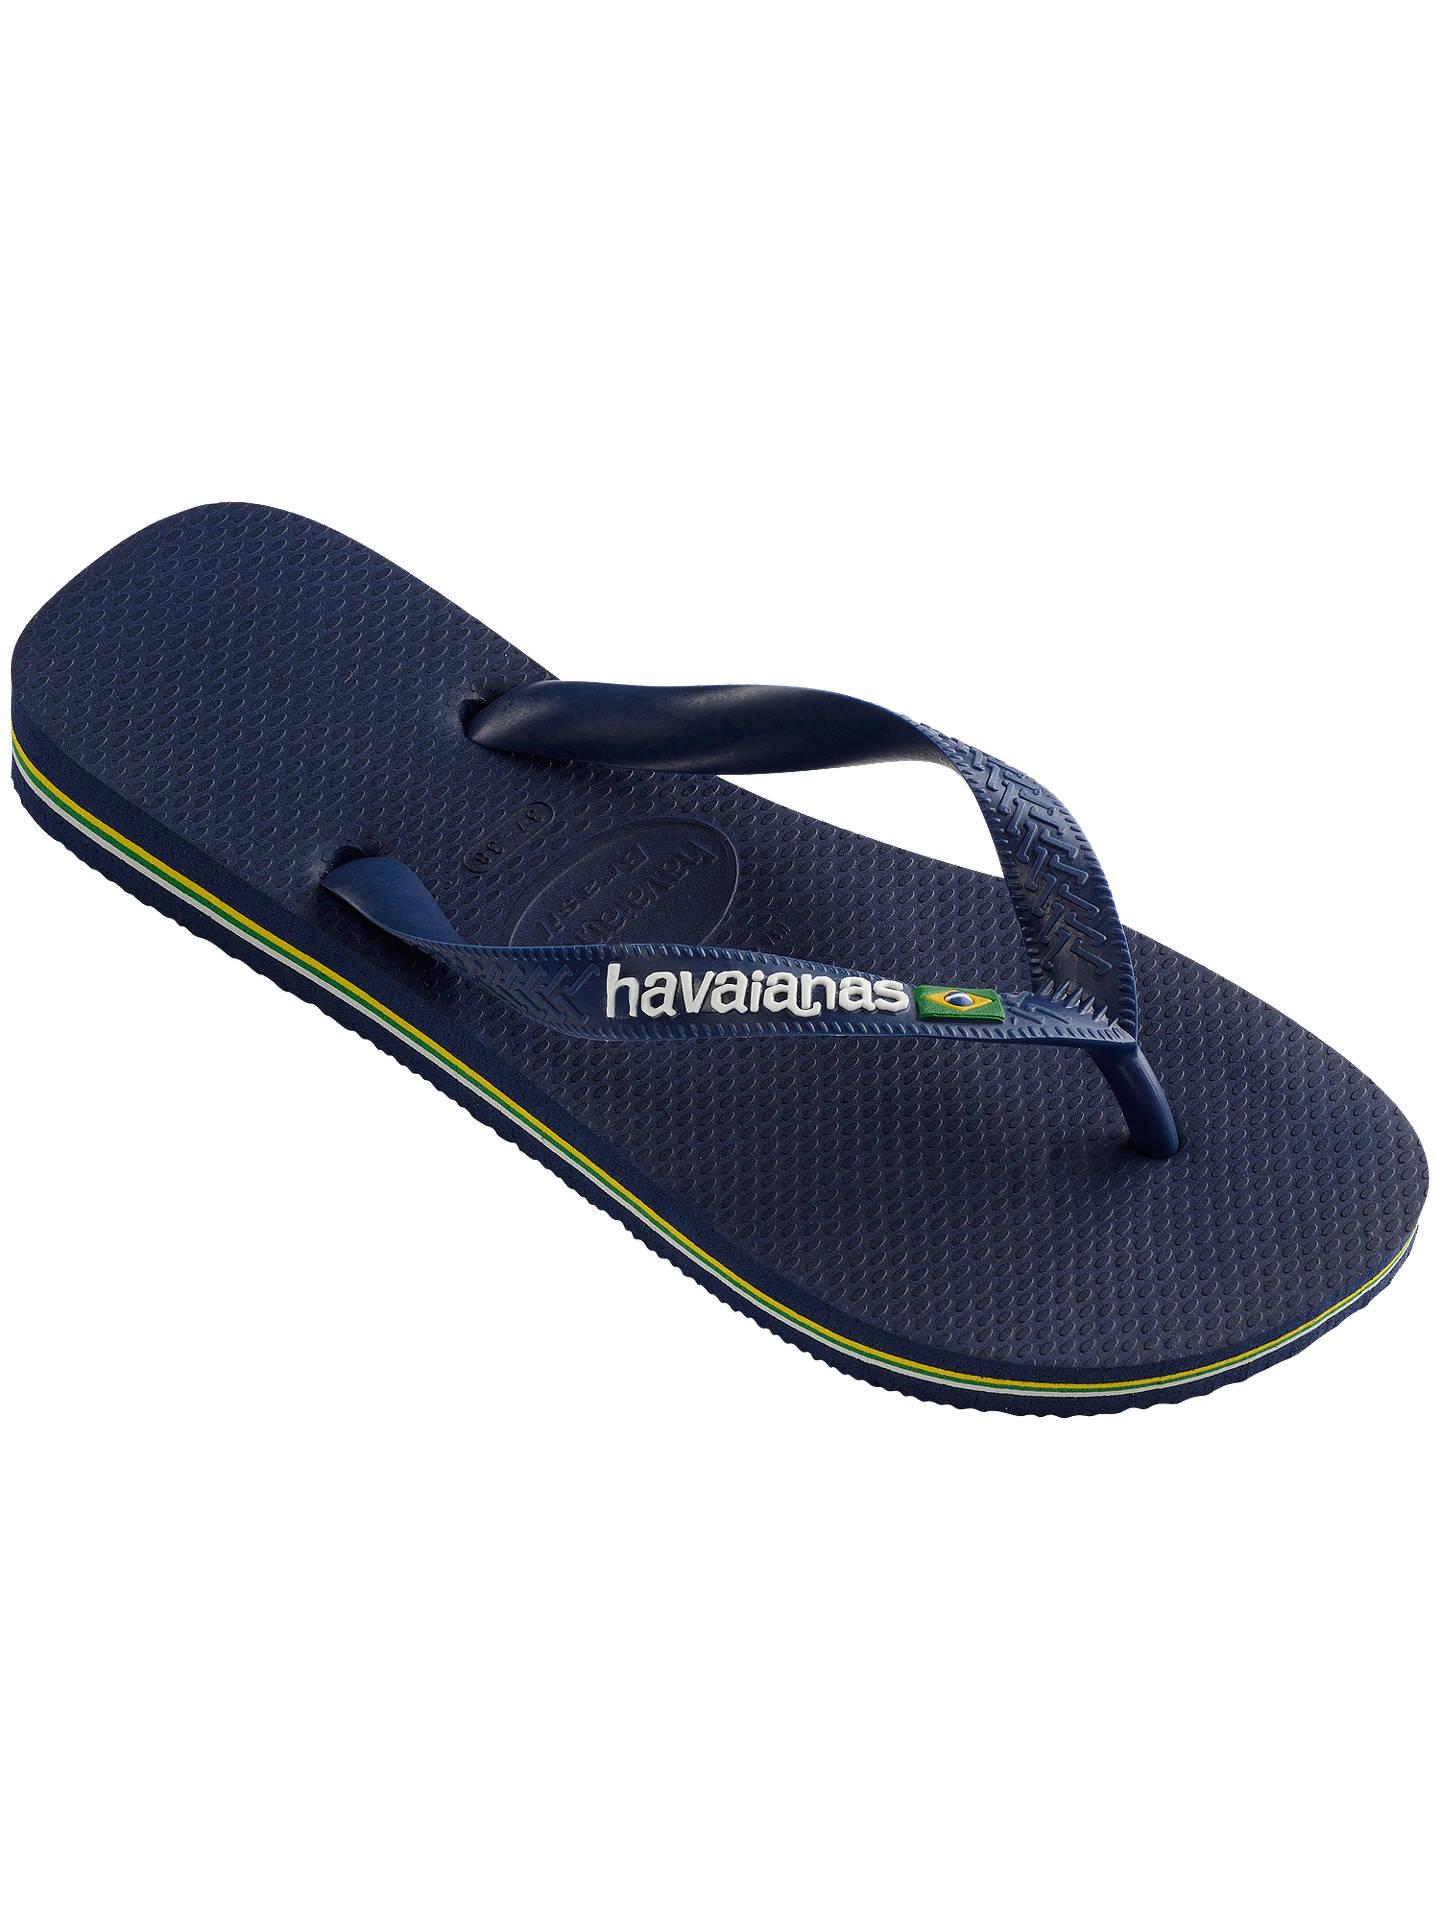 9c4f05e1e ... Buy Havaianas Brasil Logo Flip Flops